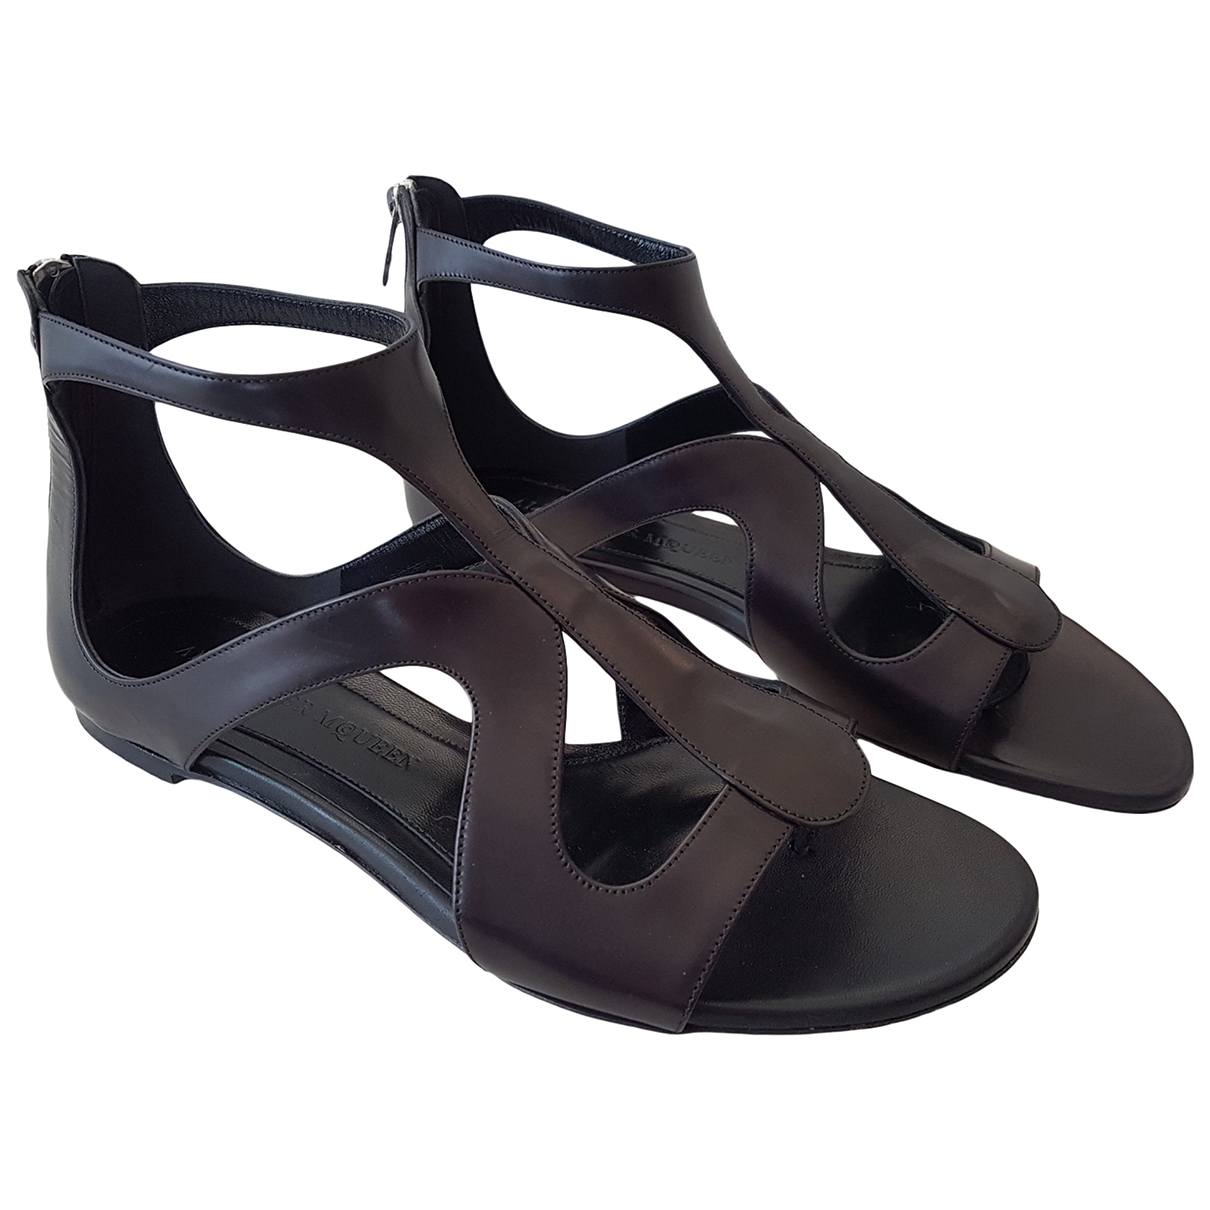 Alexander Mcqueen \N Black Leather Sandals for Women 41 EU